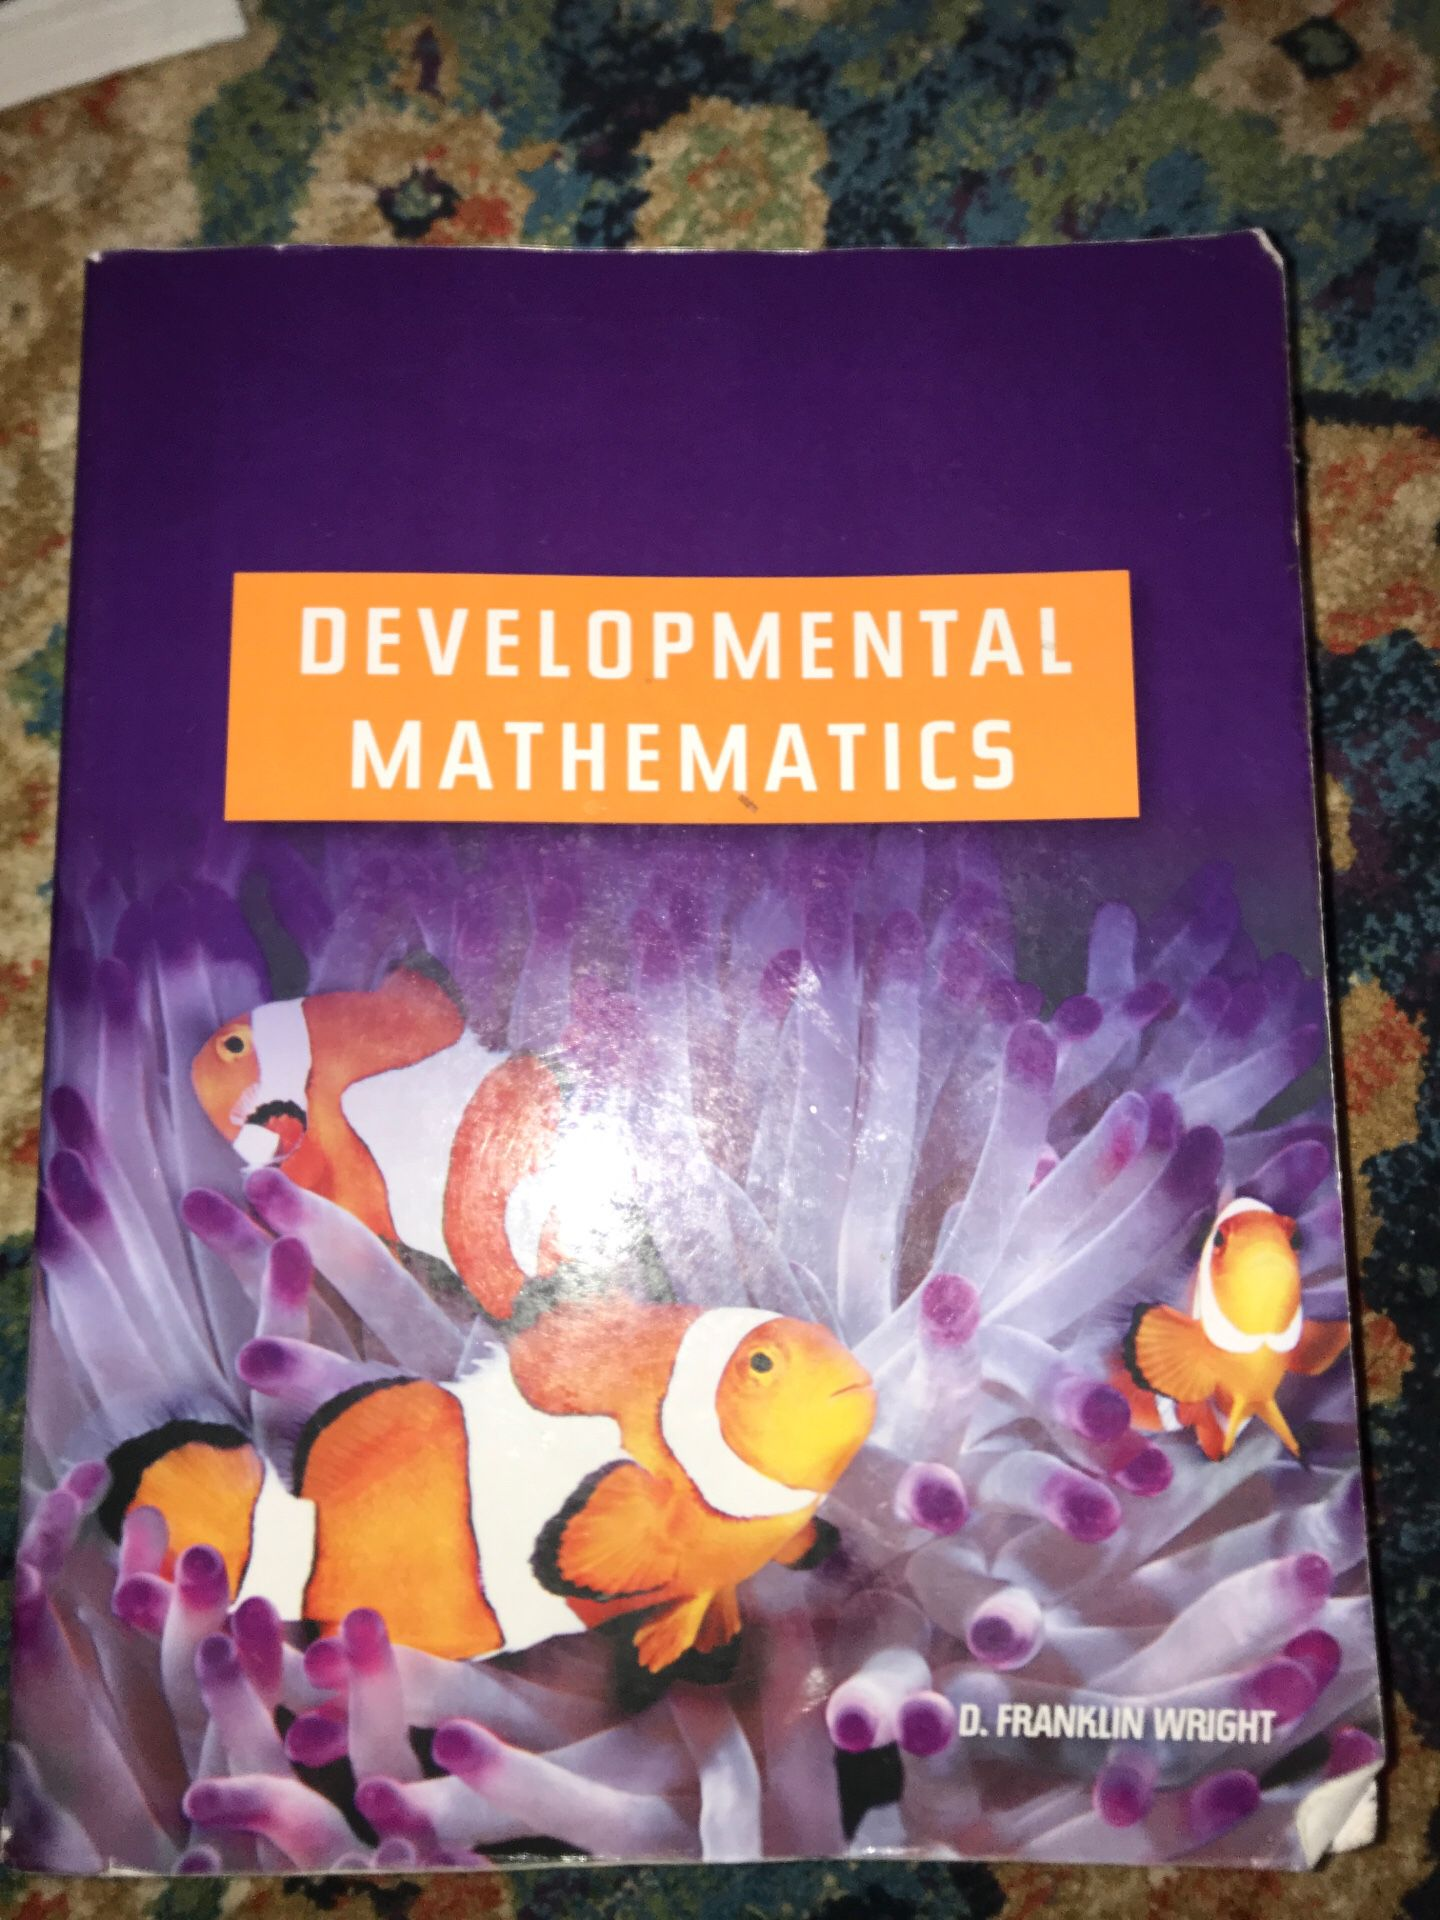 Developmental Mathematics book